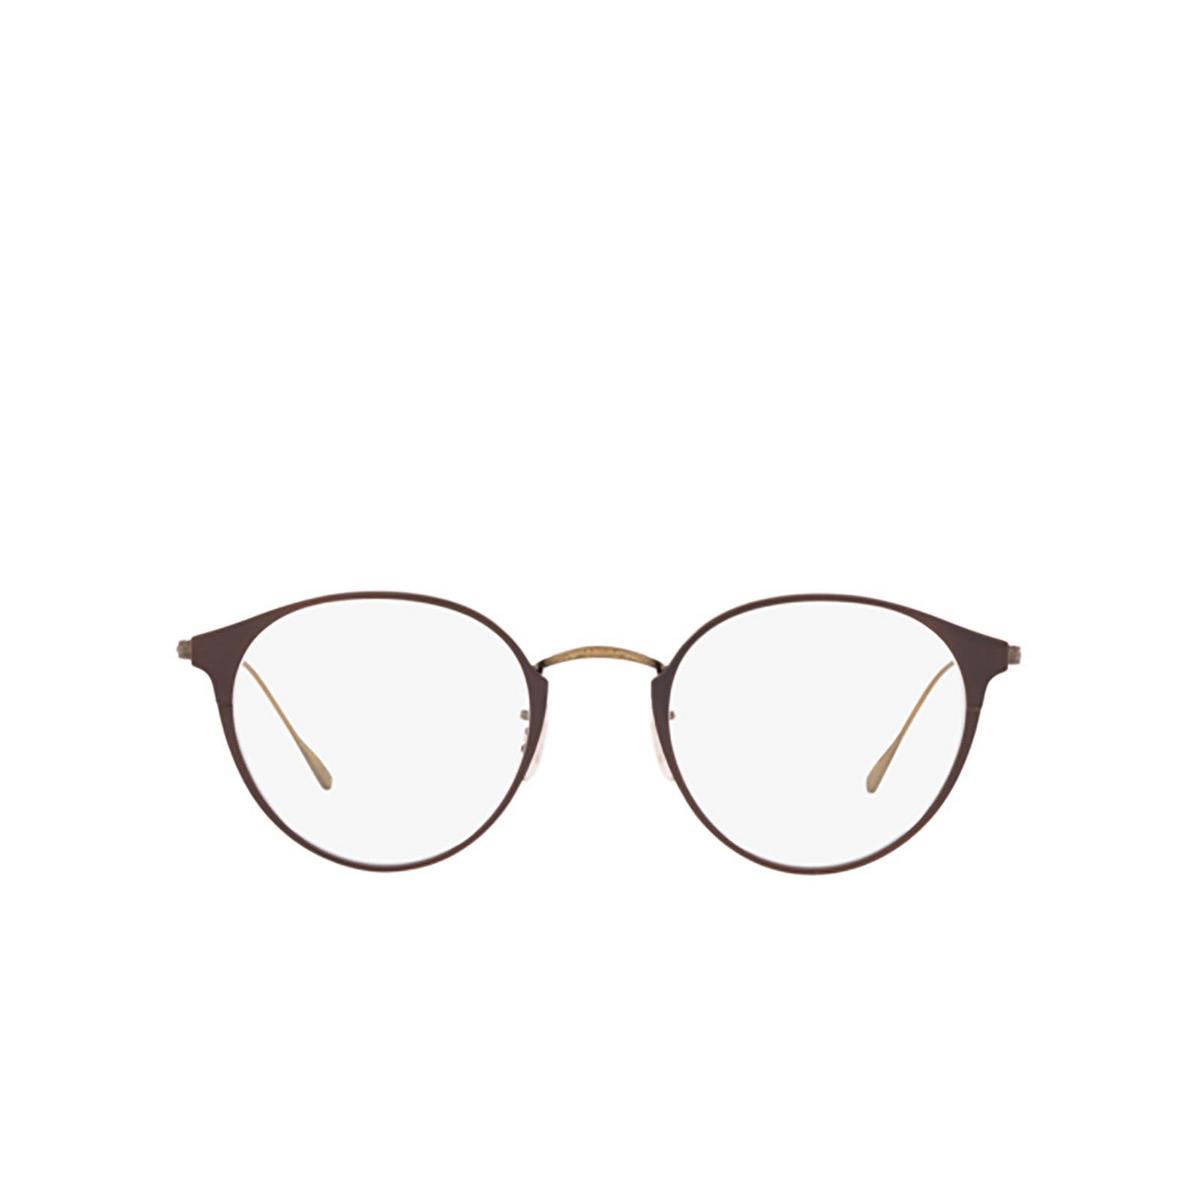 Oliver Peoples® Round Eyeglasses: Otteson OV1260TD color Birch / Antique Gold 5282.